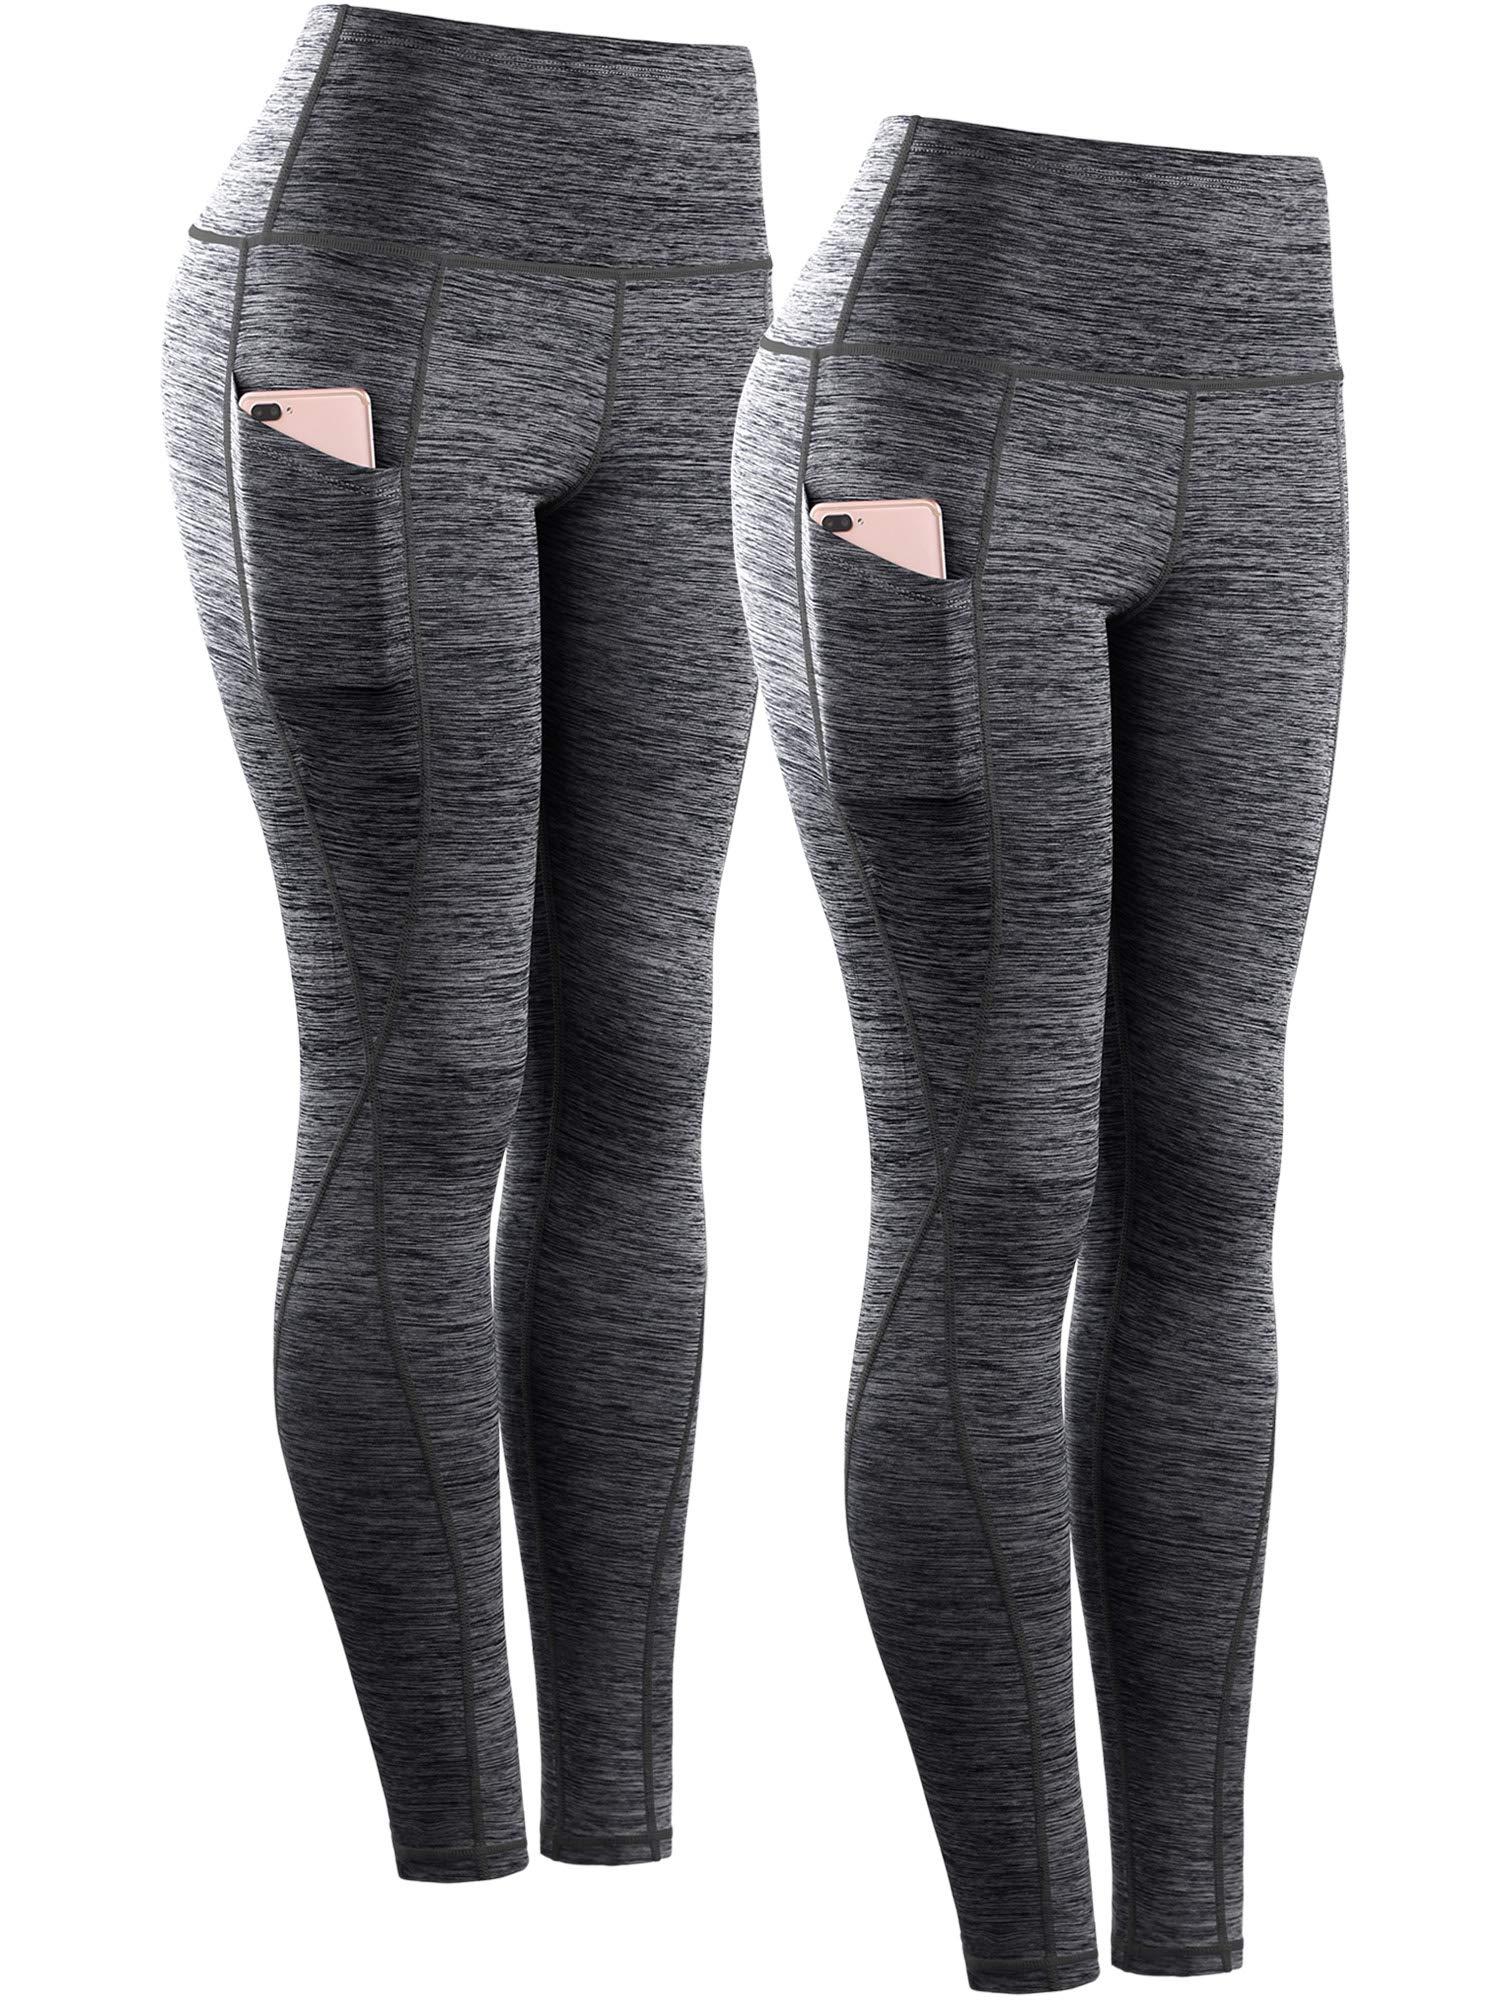 Neleus Women's Yoga Pant Running Workout Leggings with Pocket Tummy Control High Waist,9033,2 Pack,Black,XL,EU 2XL by Neleus